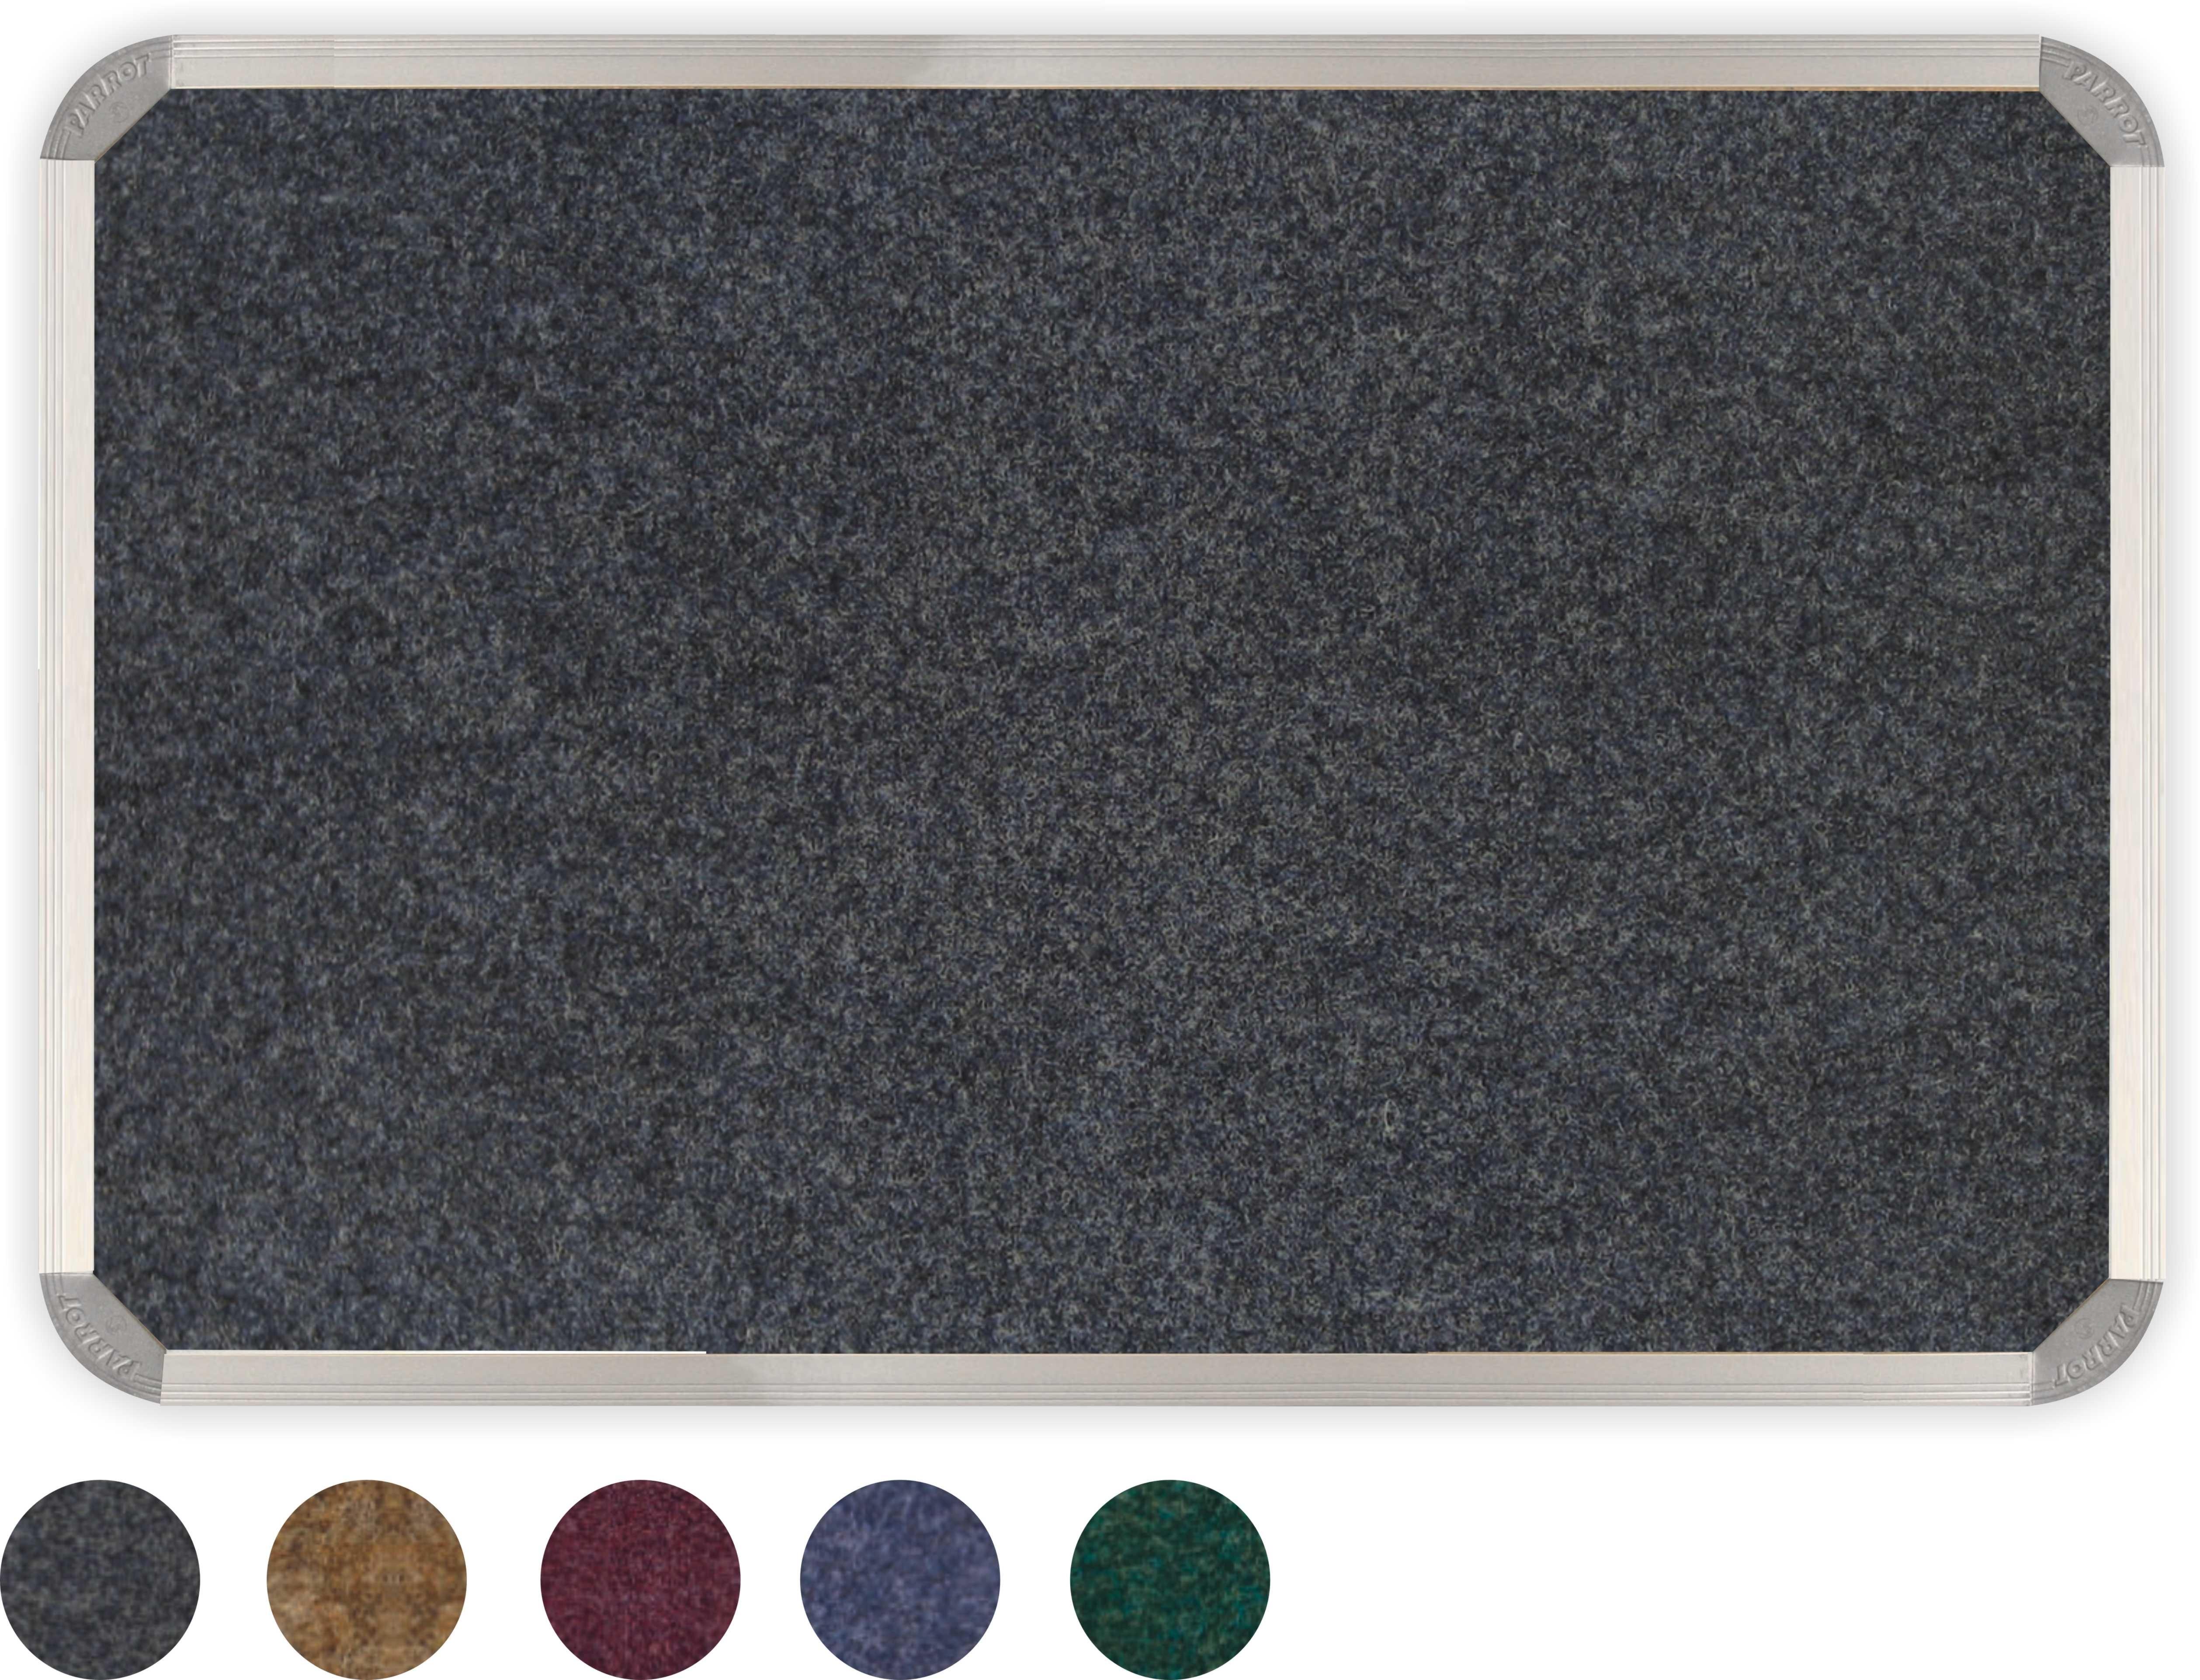 Parrot Bulletin Board Alum Frame 1200mmx900mmmm Denim